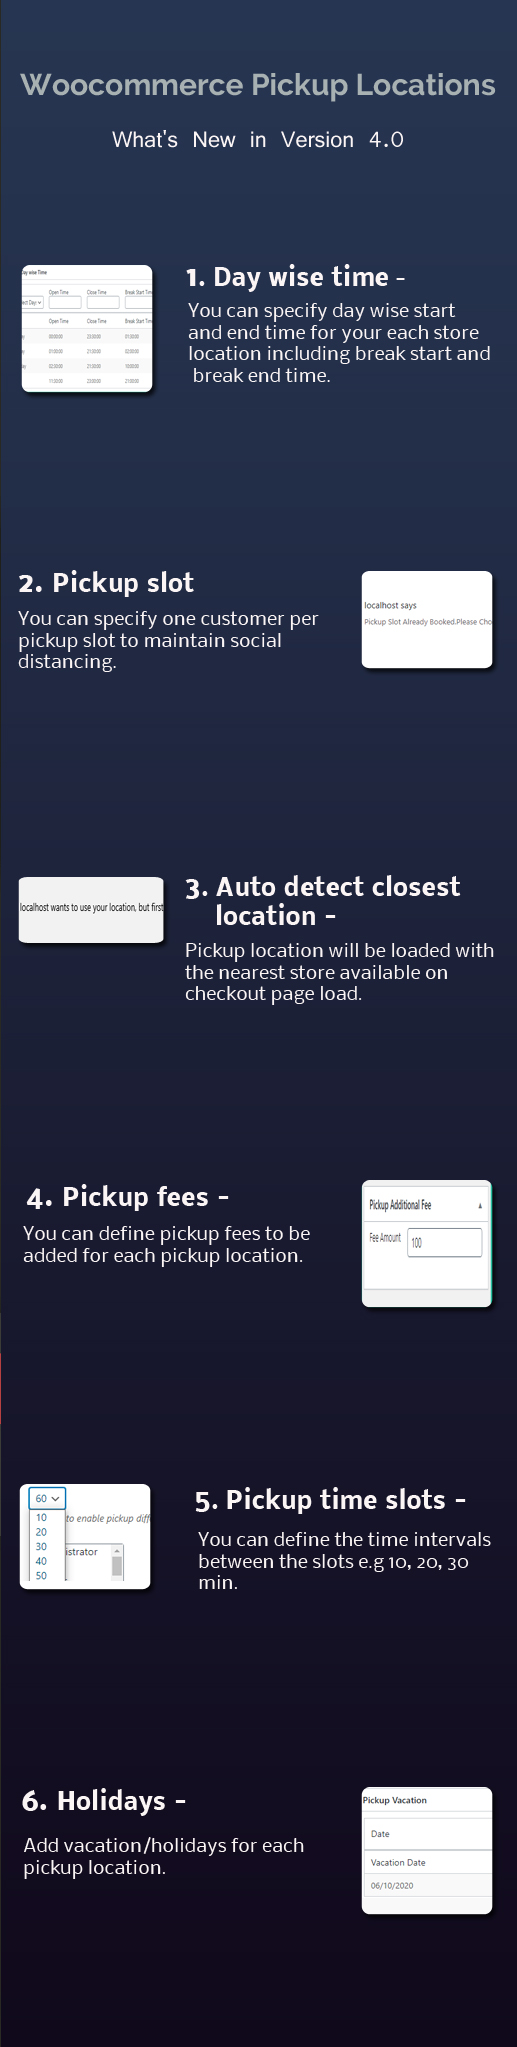 Woocommerce Pickup locations version 4